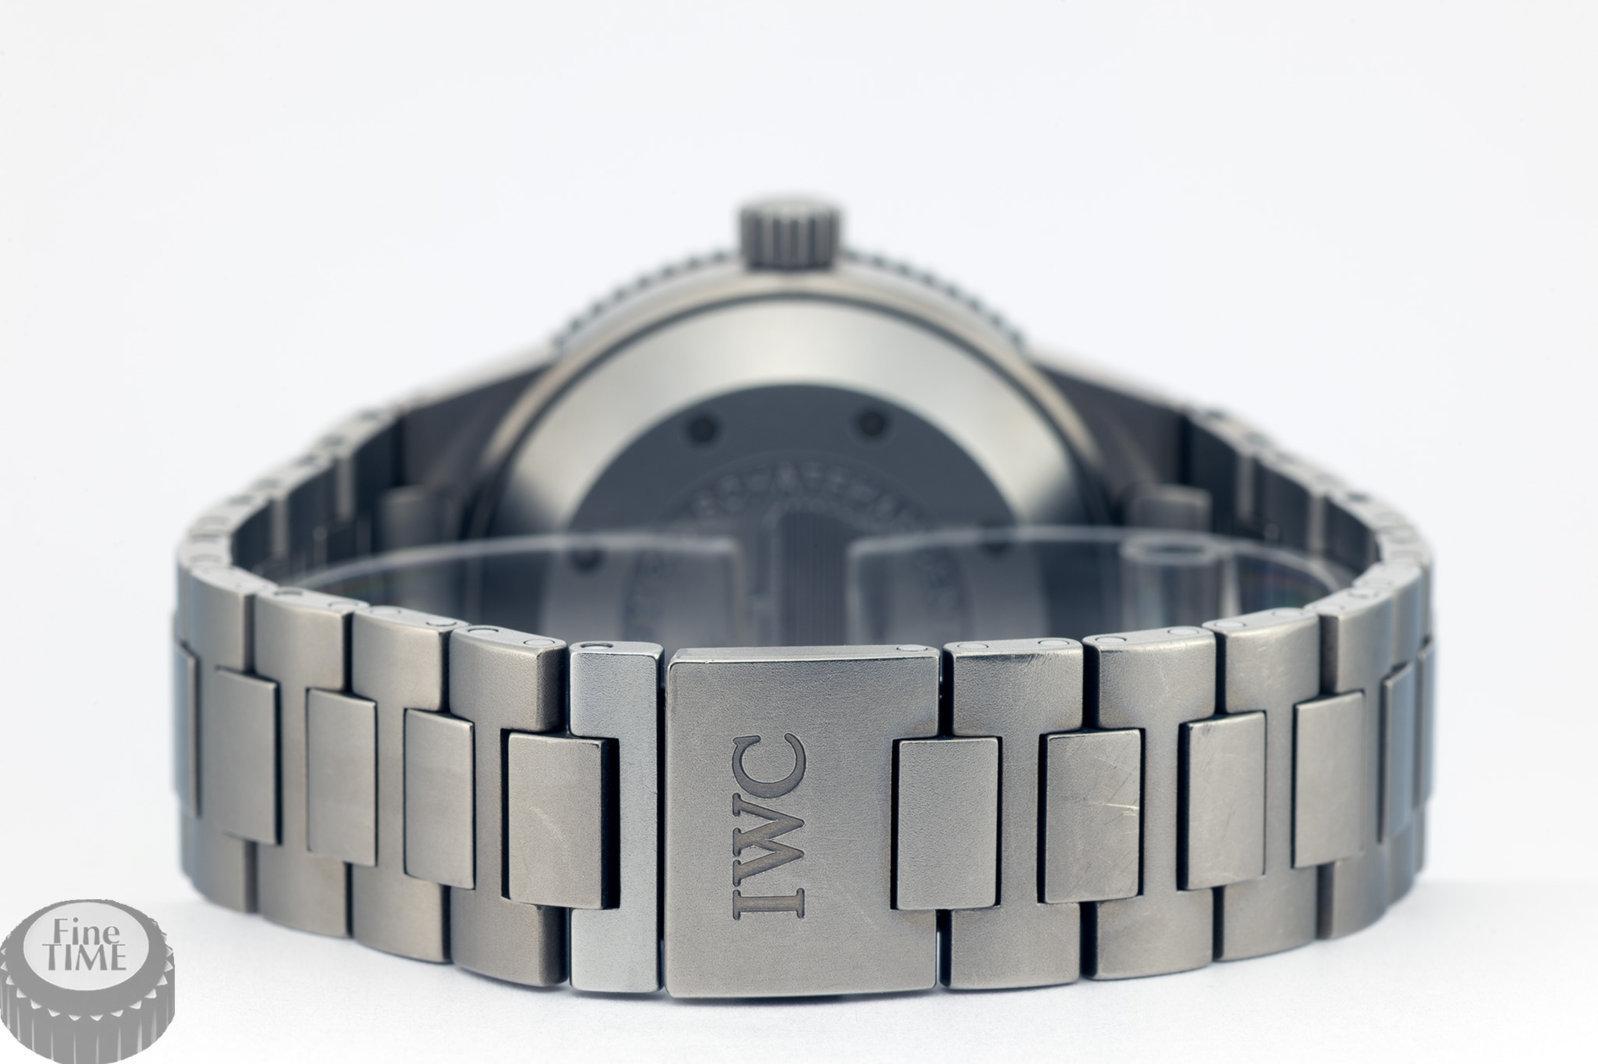 iwc-aquatimer-gst-iw3536-001-titanium-03.jpg